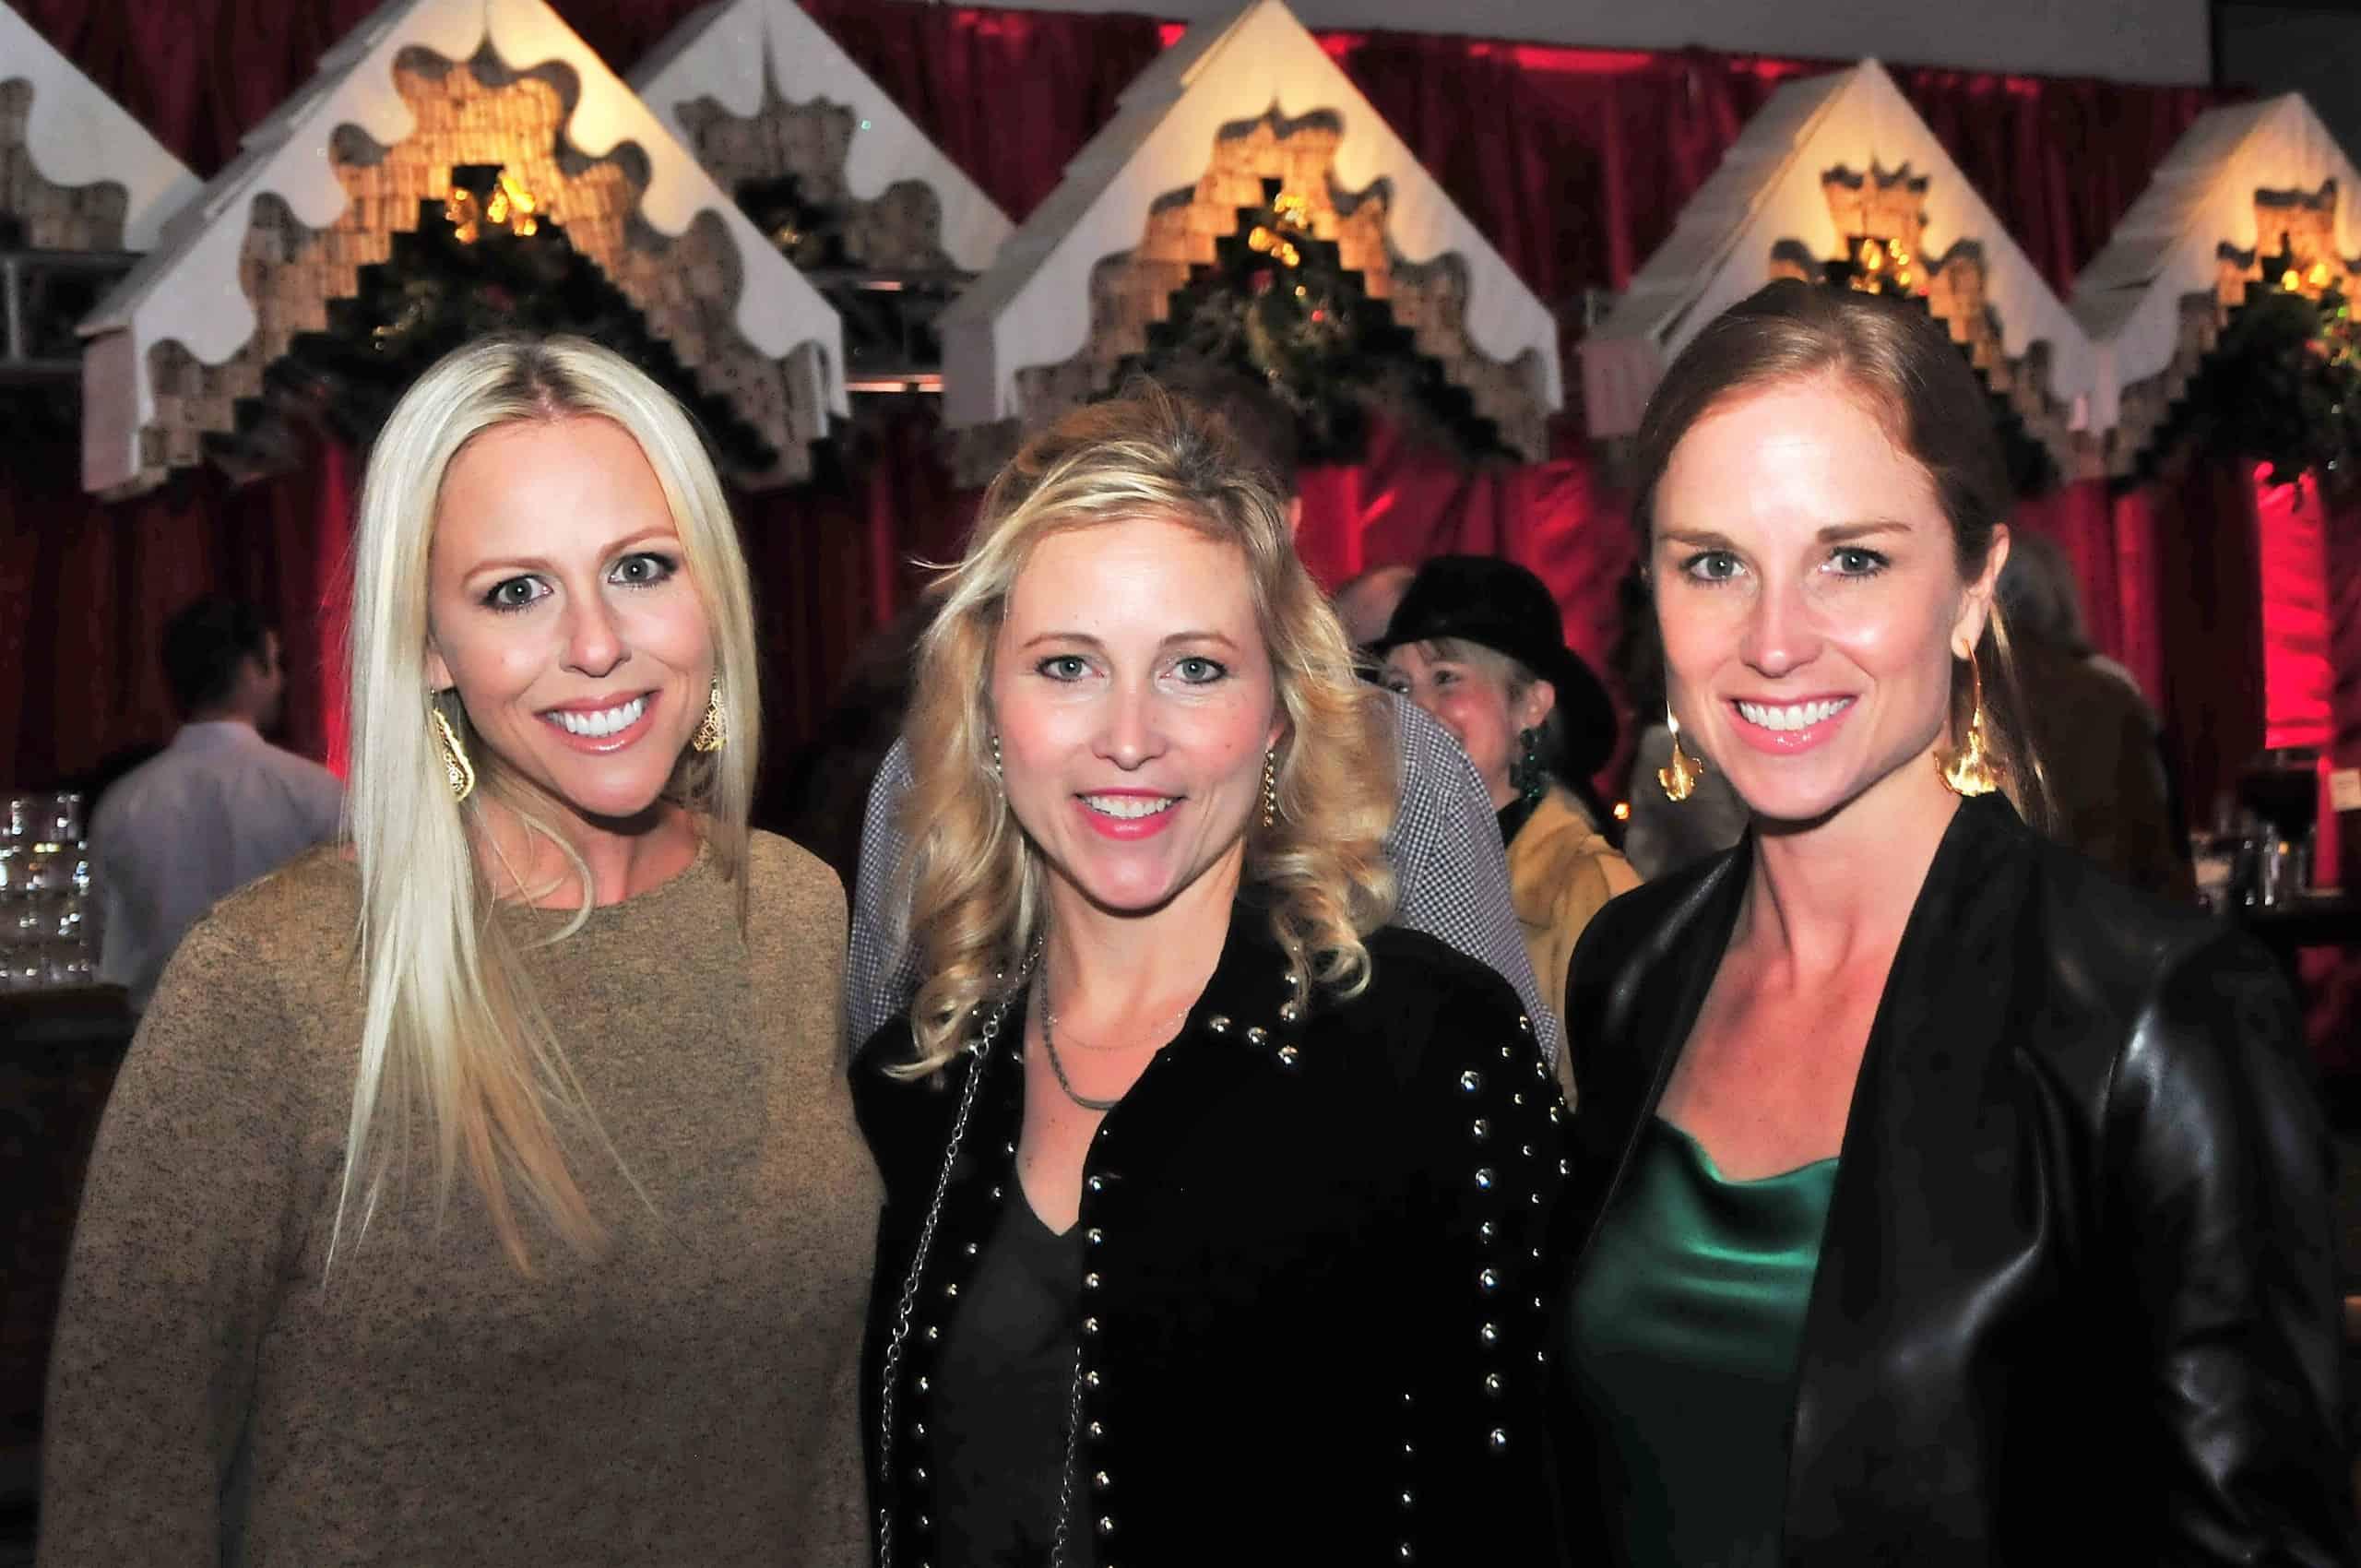 Lindsey Ashcroft, Courtney Percy and Stacy Smaistrla